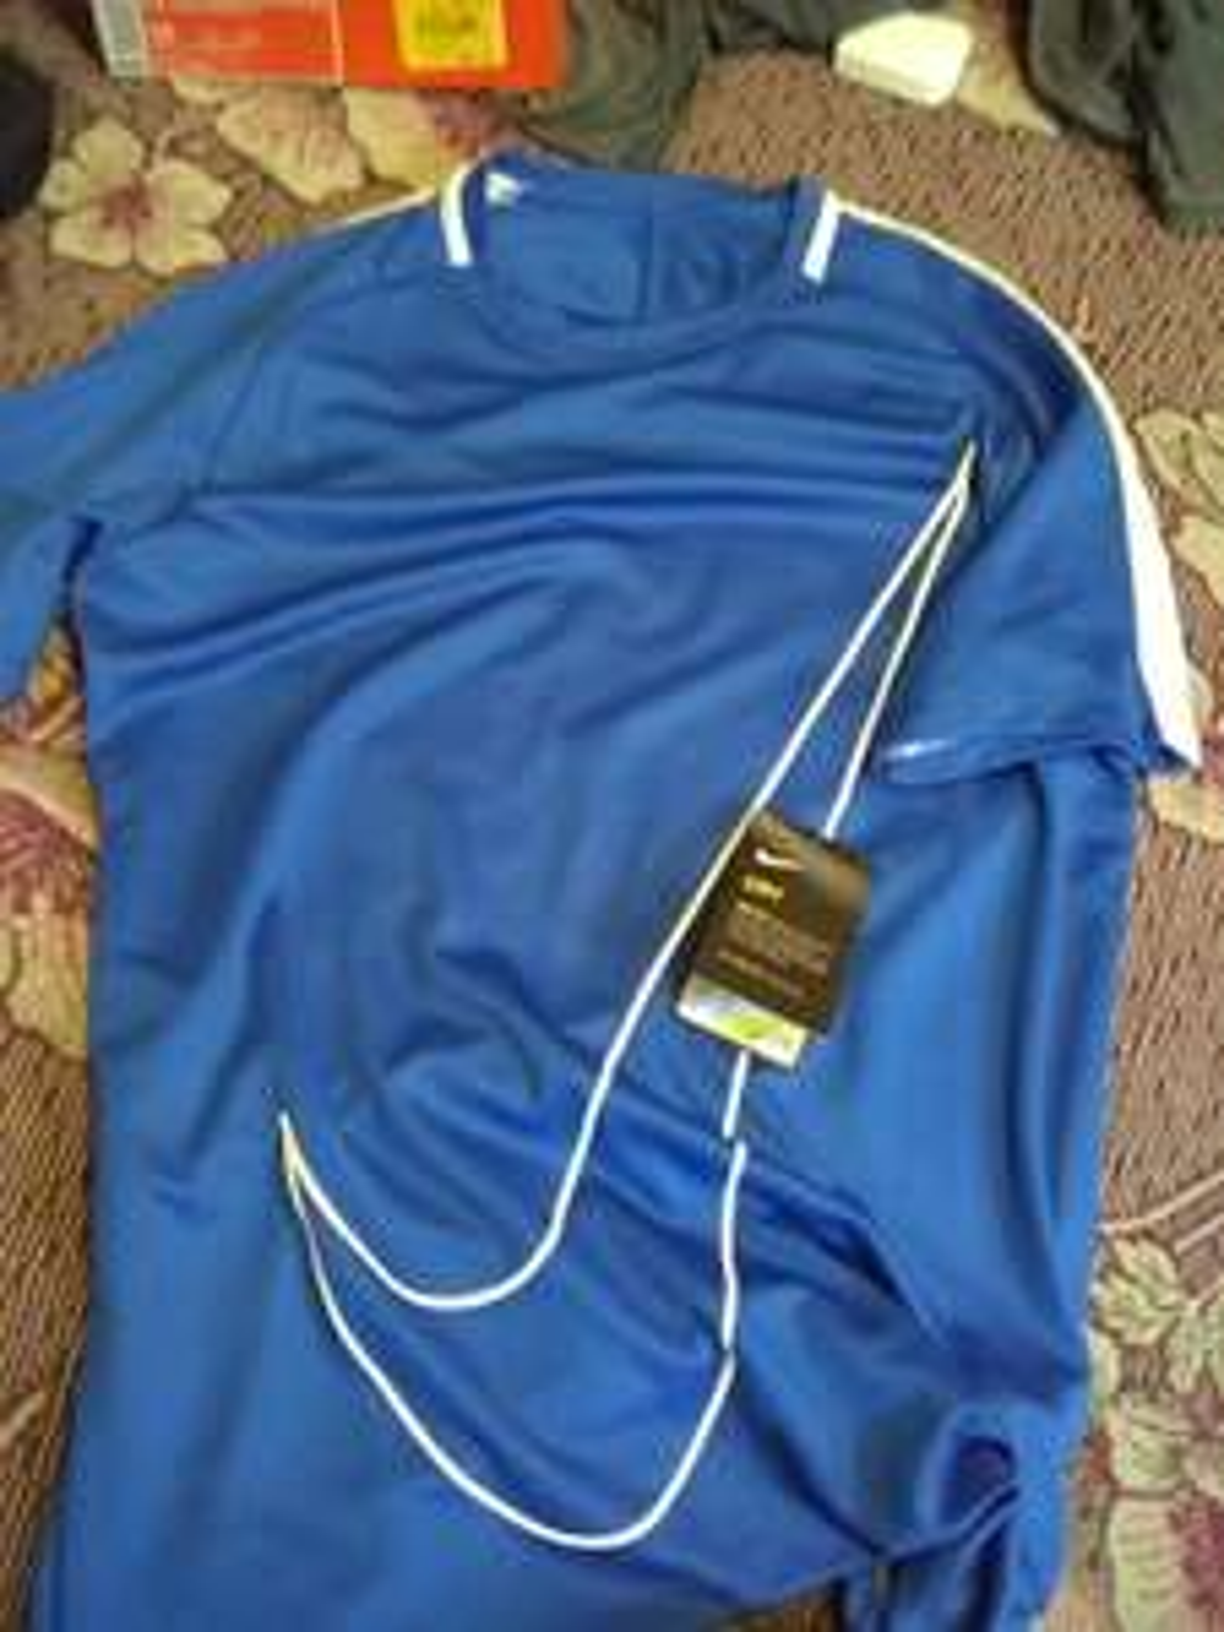 Coppel: Playera Nike Dry Azul de 400 a 159